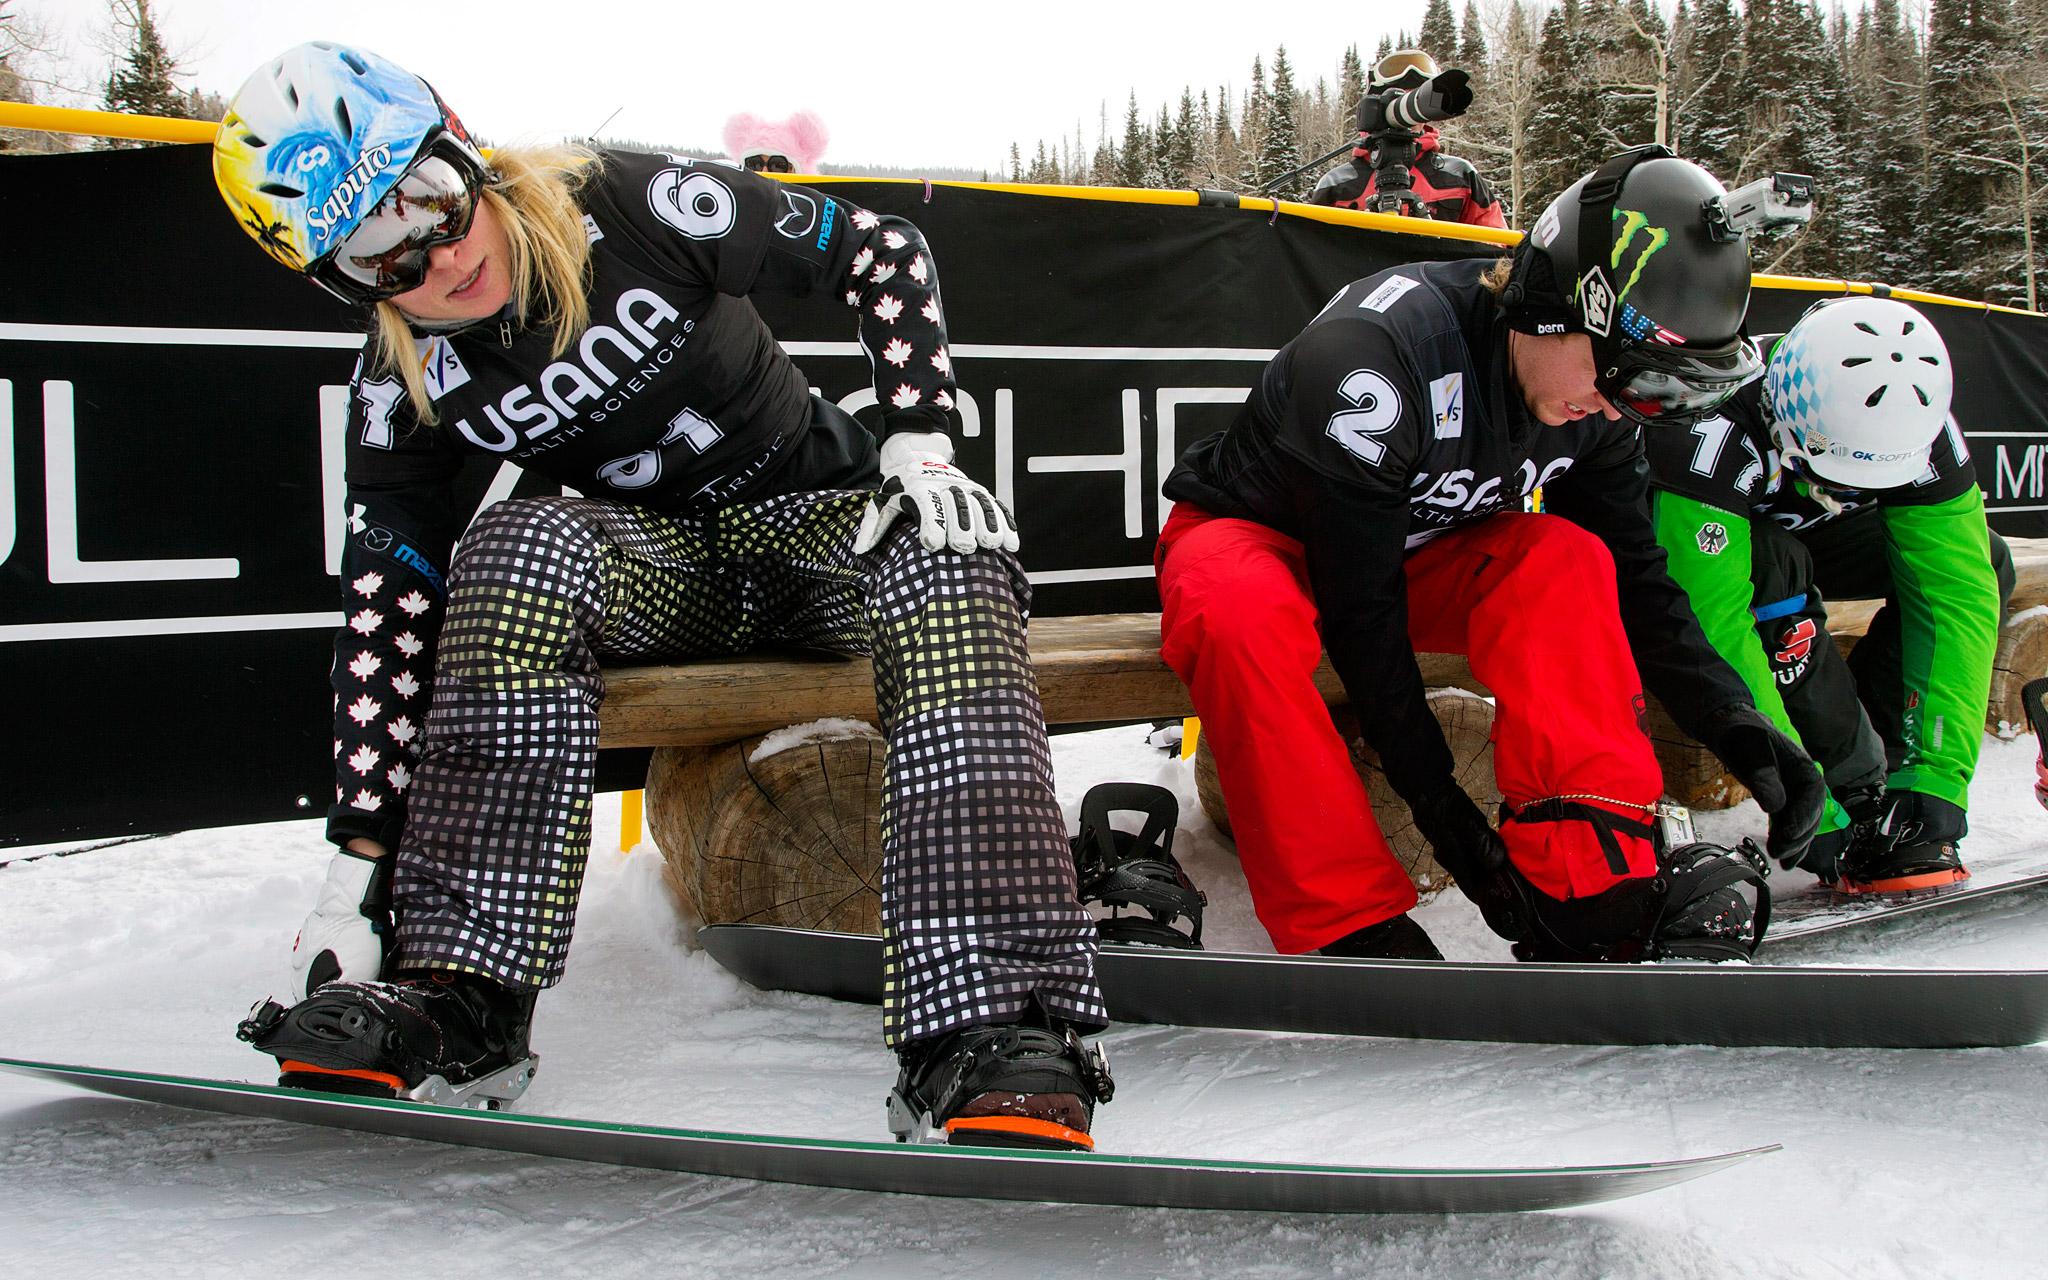 Snowboarding cross